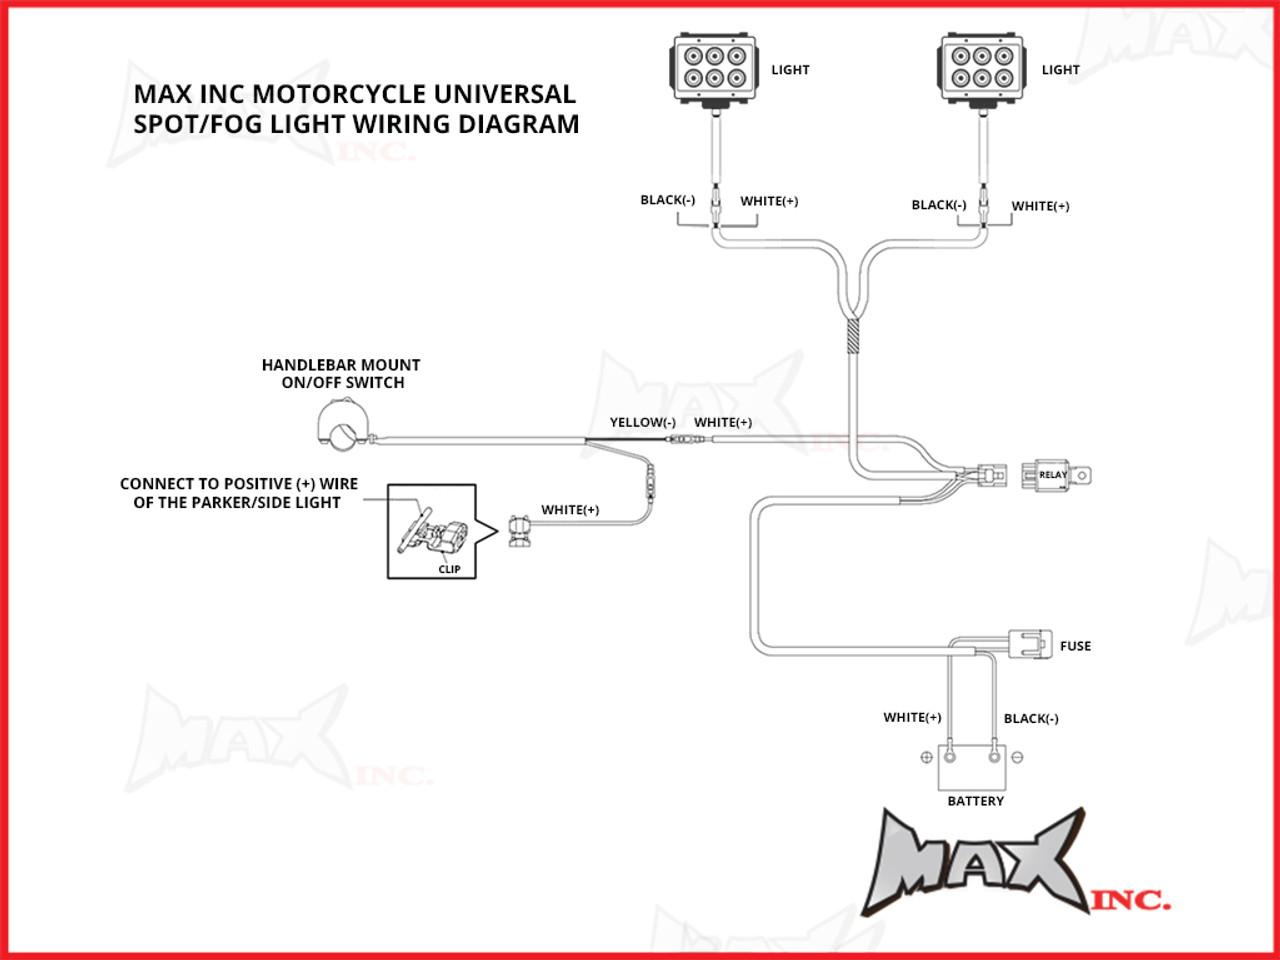 toyota hilux electrical wiring diagram [ 1280 x 960 Pixel ]